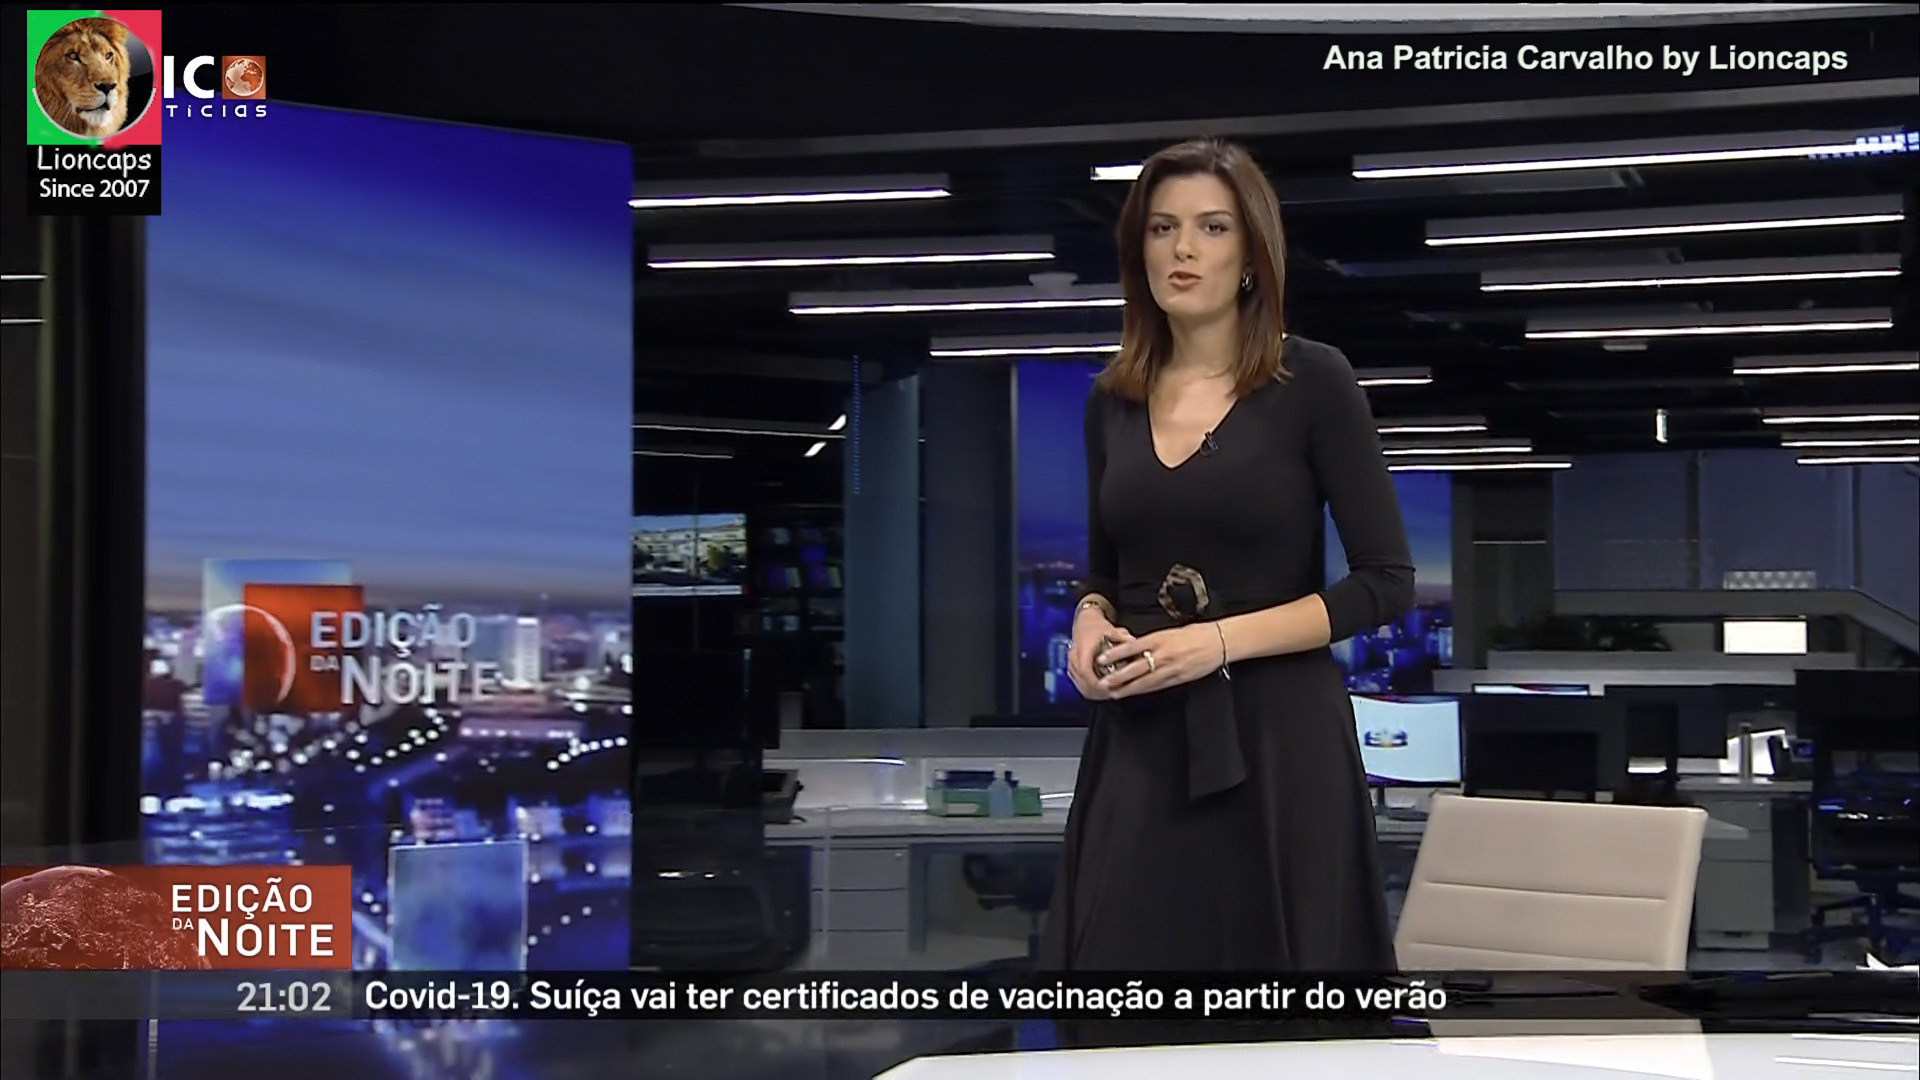 ana_patricia_carvalho_sicn_lioncaps_30_05_2021 (17).jpg